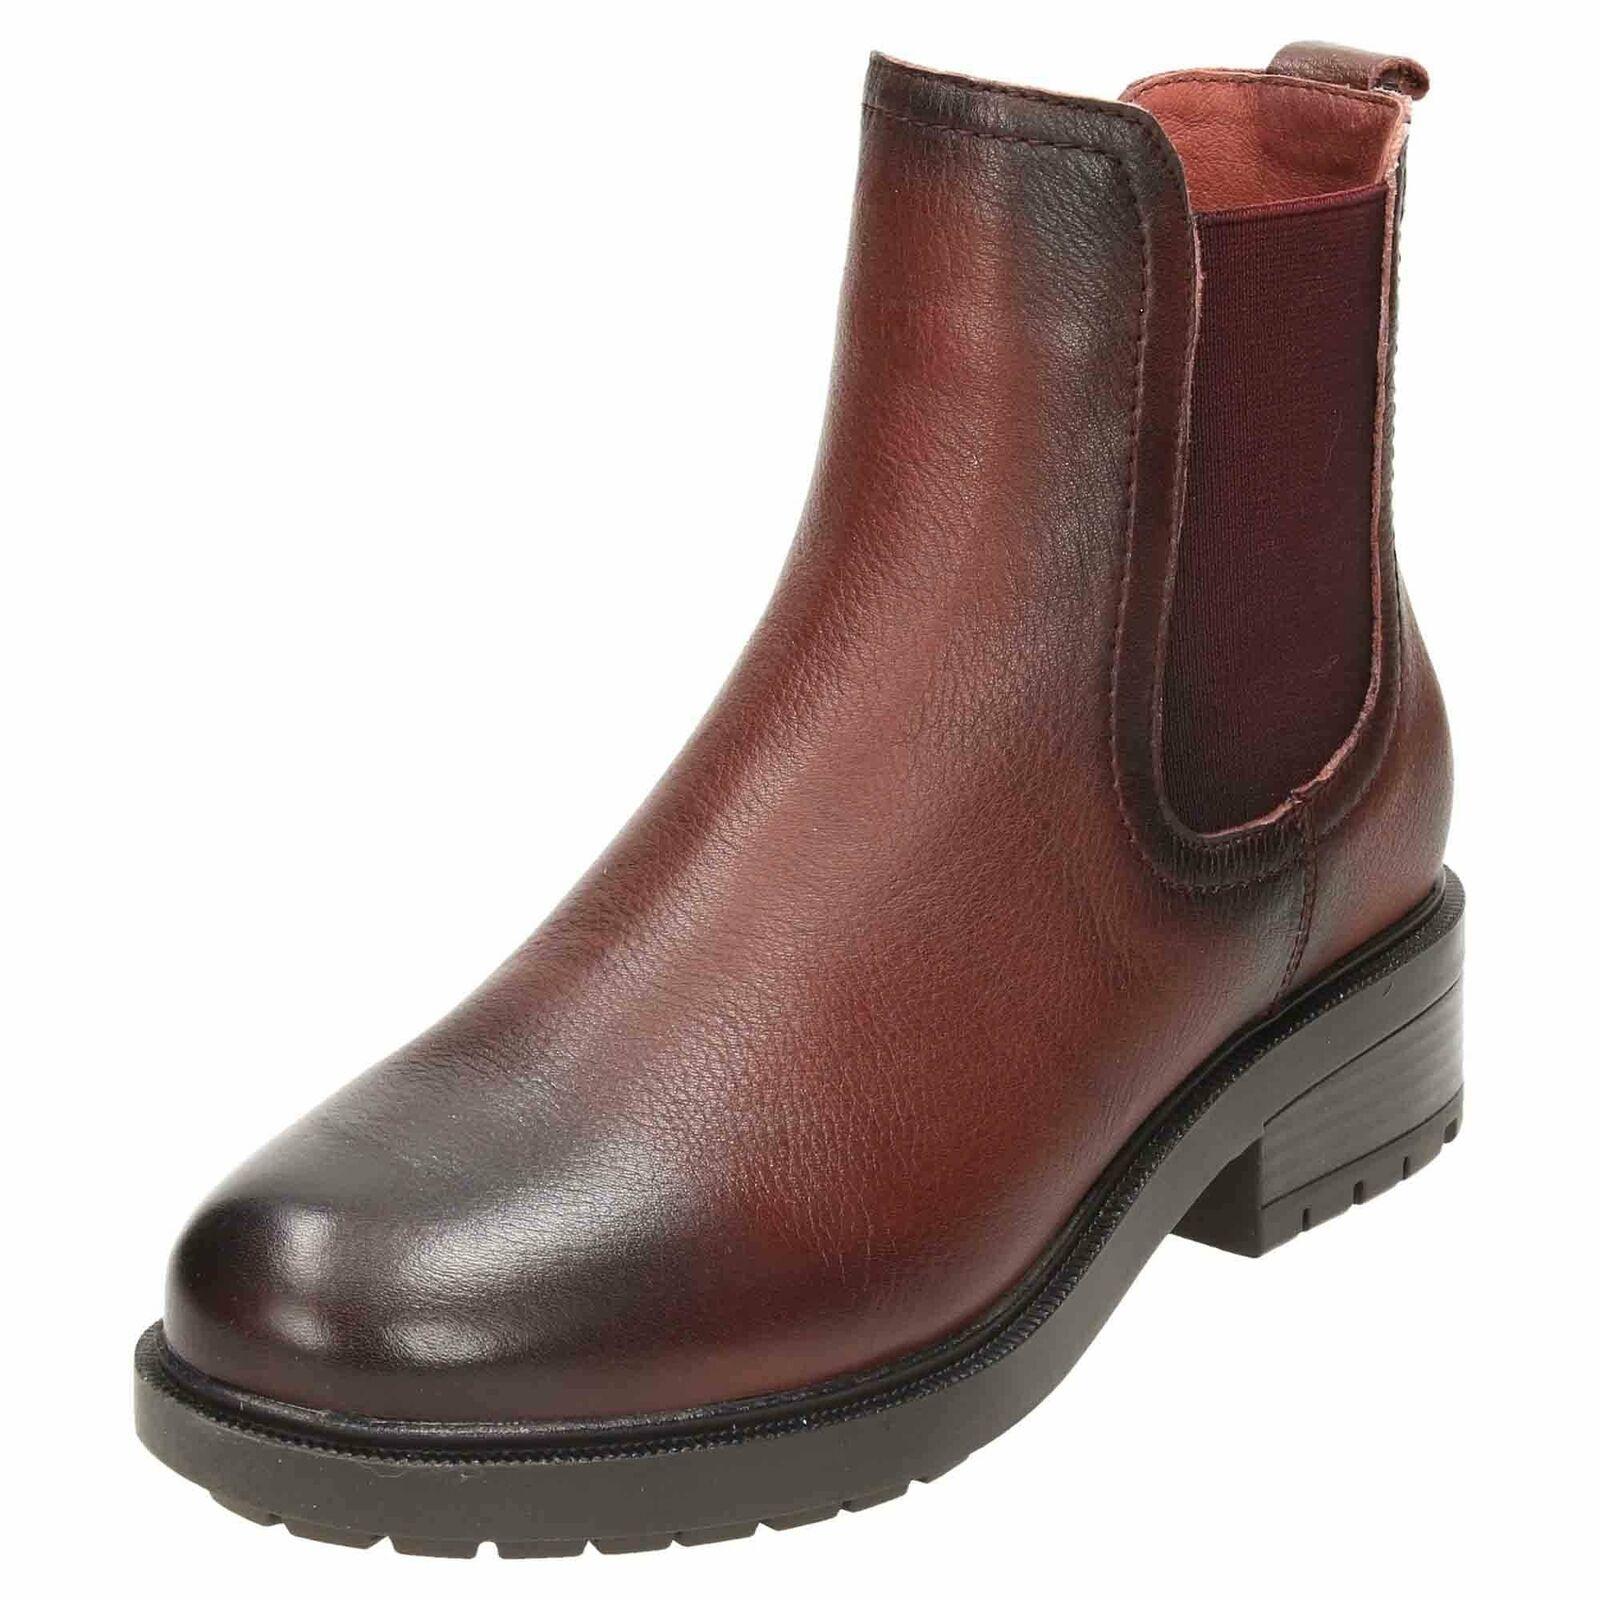 Carmela Leather Chelsea Ankle Stiefel 66963 Burgundy Pull On Flat Biker schuhe